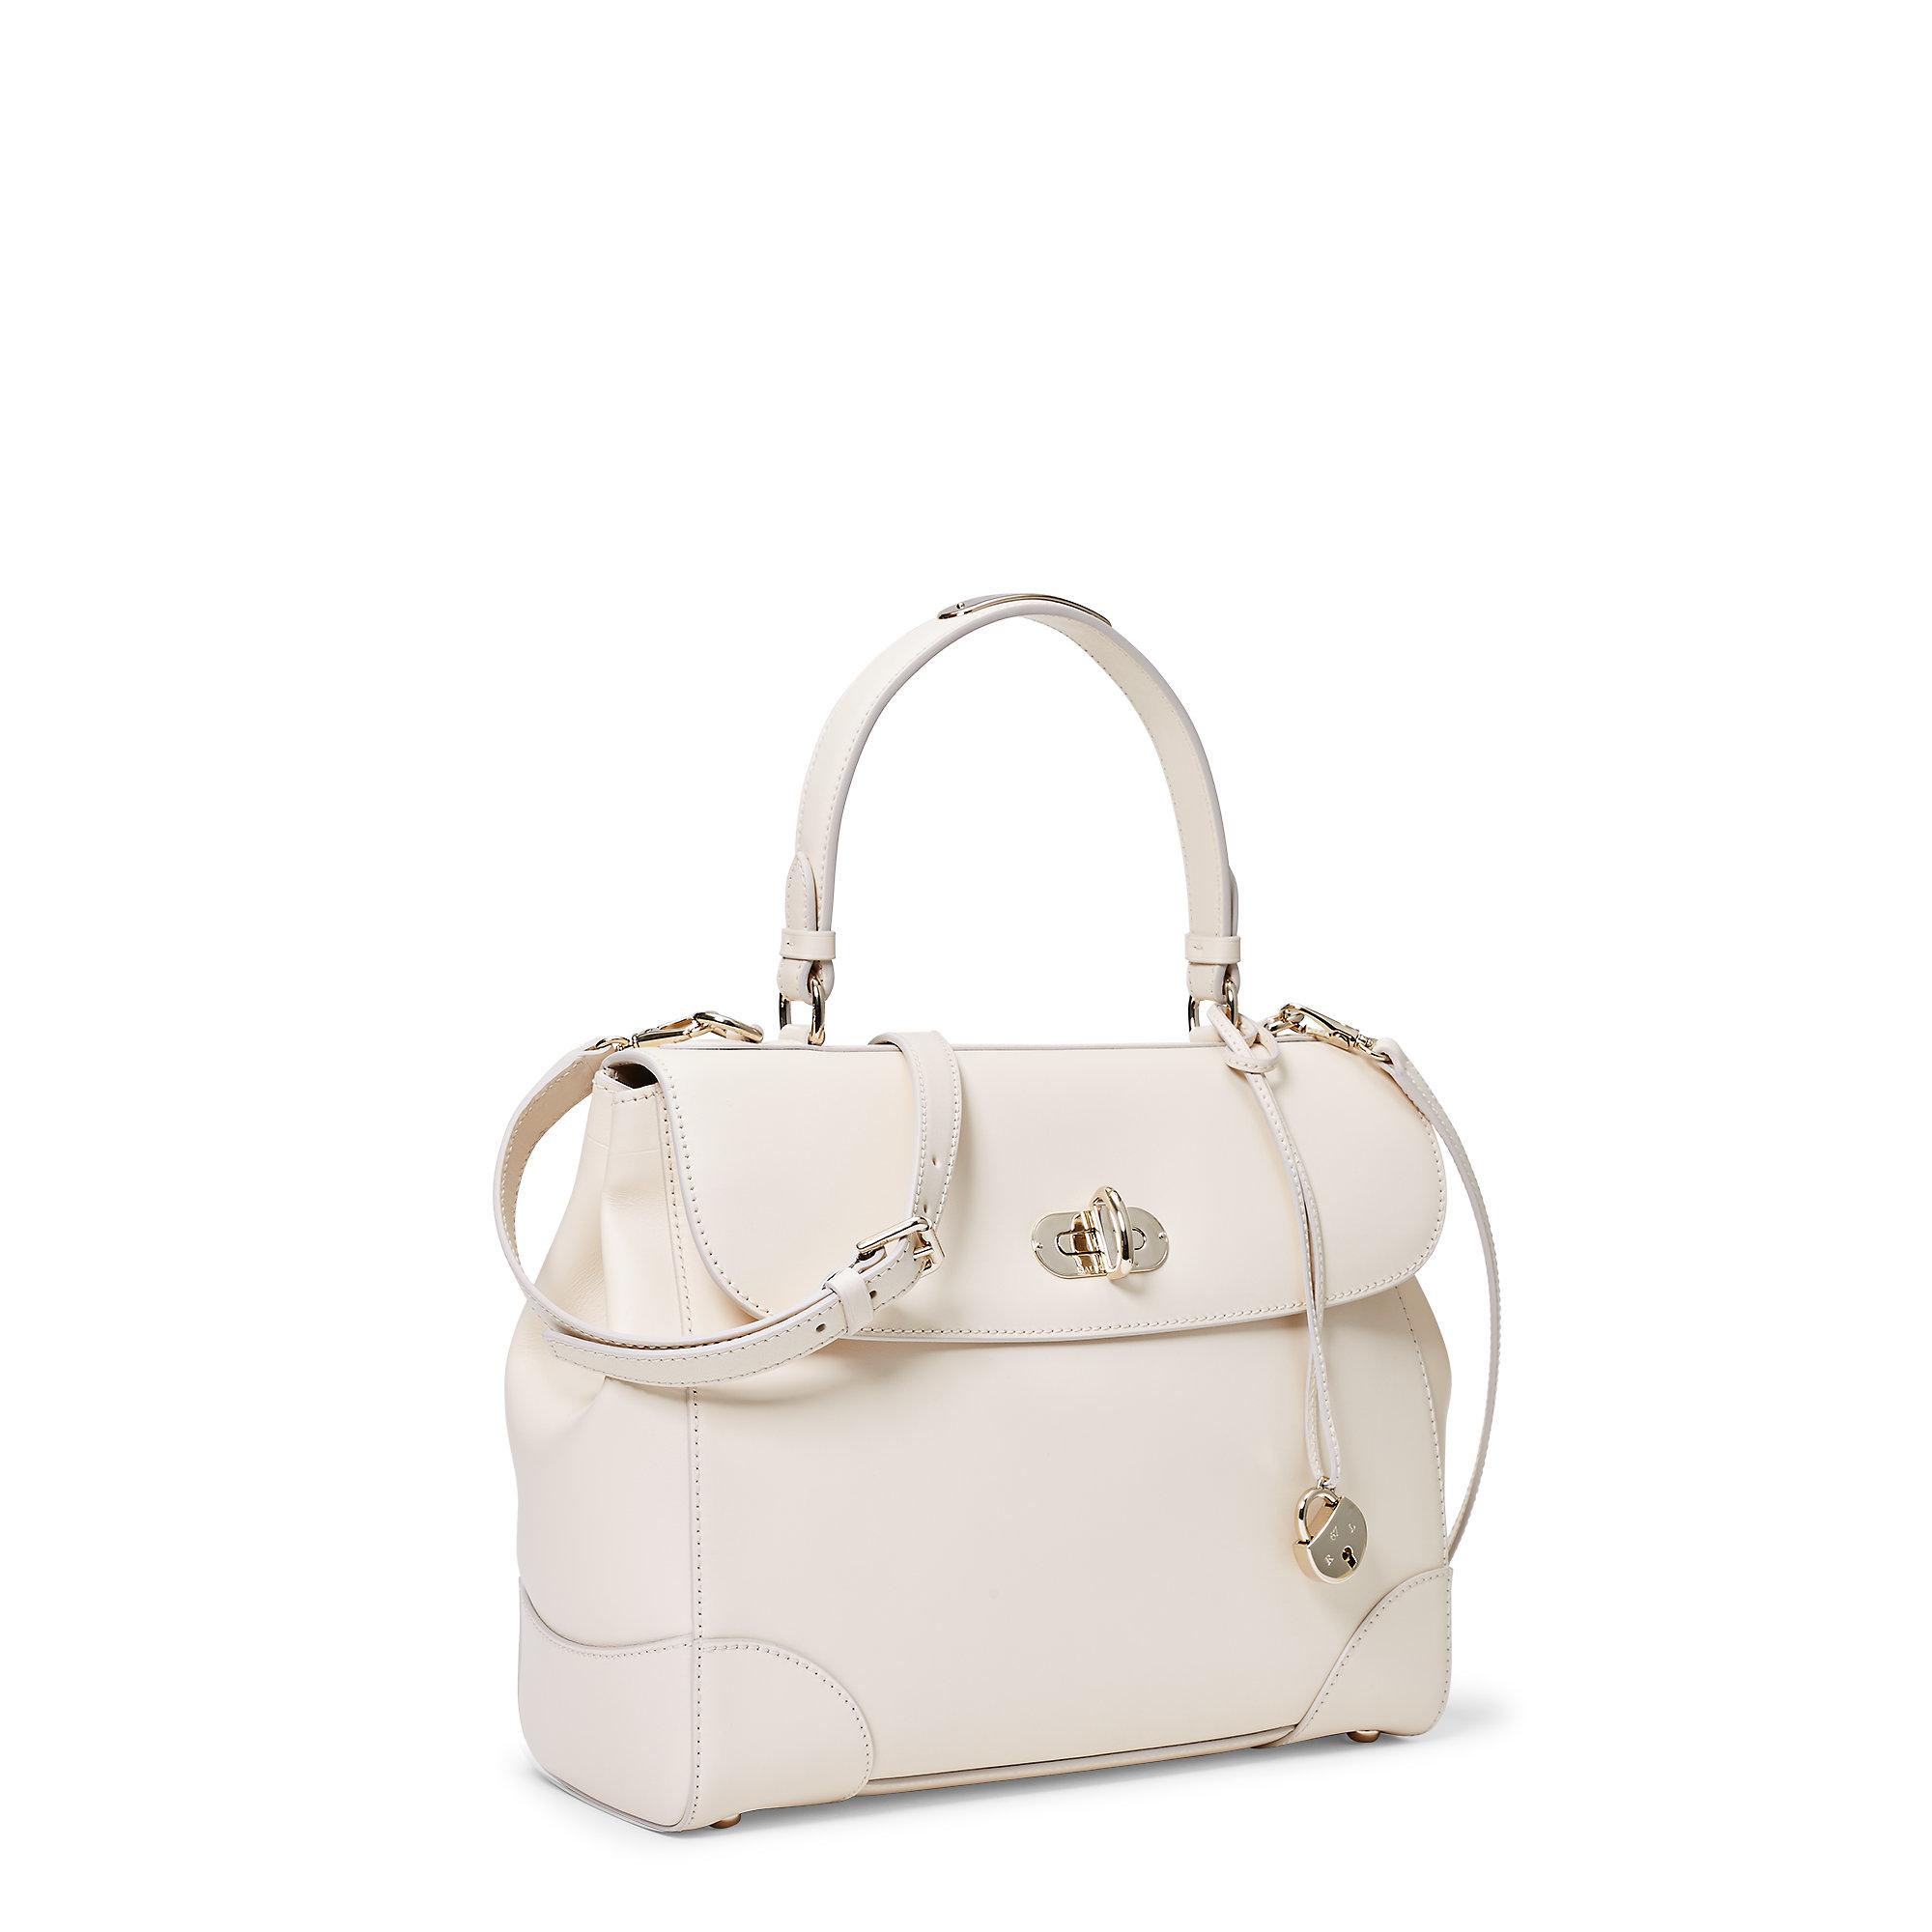 44e148f8b7 Lyst Pink Pony Medium Calfskin Tiffin Bag In White. Lauren Ralph Cornwall  Pebbled Leather Slouch Hobo